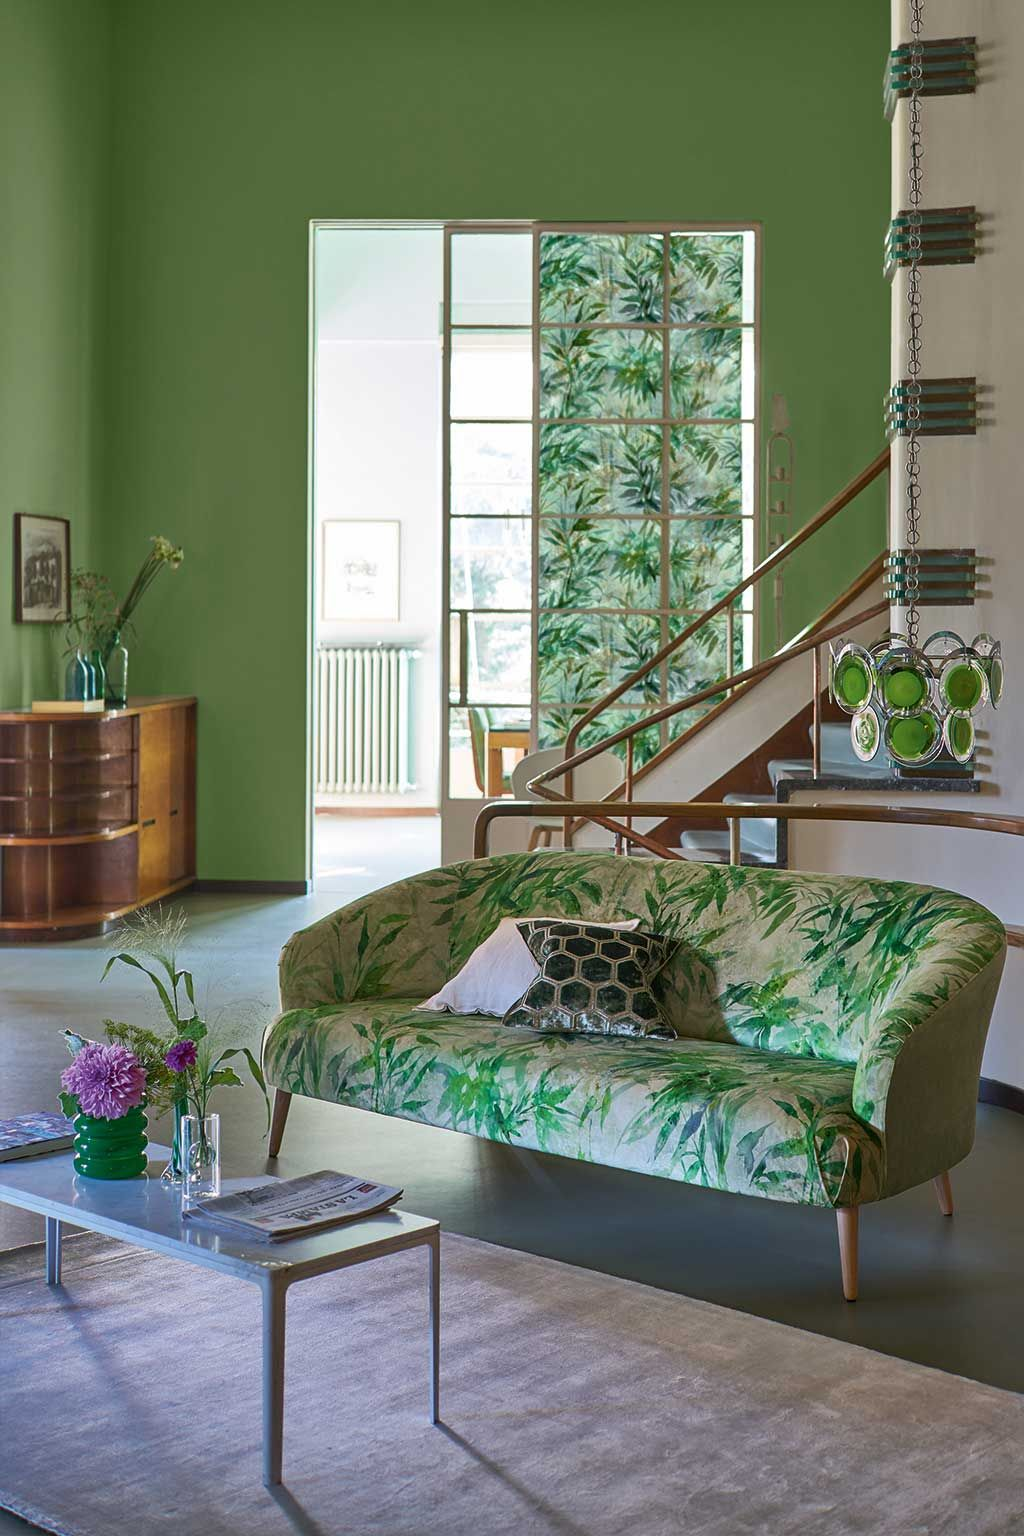 Pin by Ella Kolanowska on new mood interiors in 2020